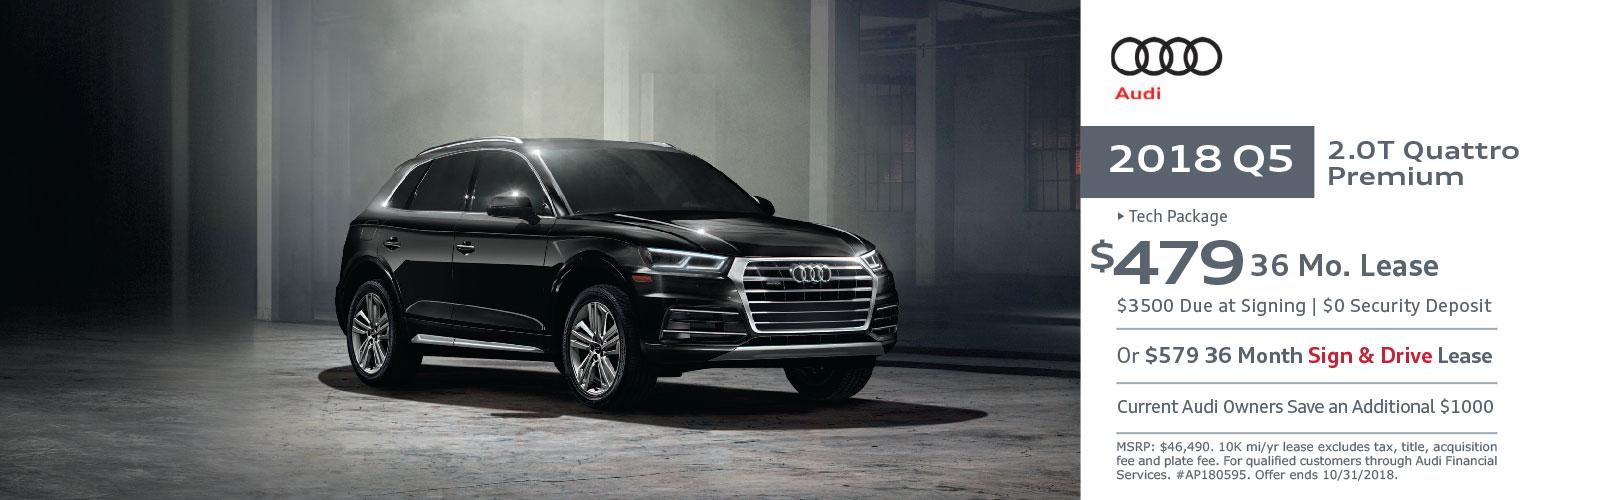 Audi Dealers Pittsburgh New BMW Release - Audi pittsburgh